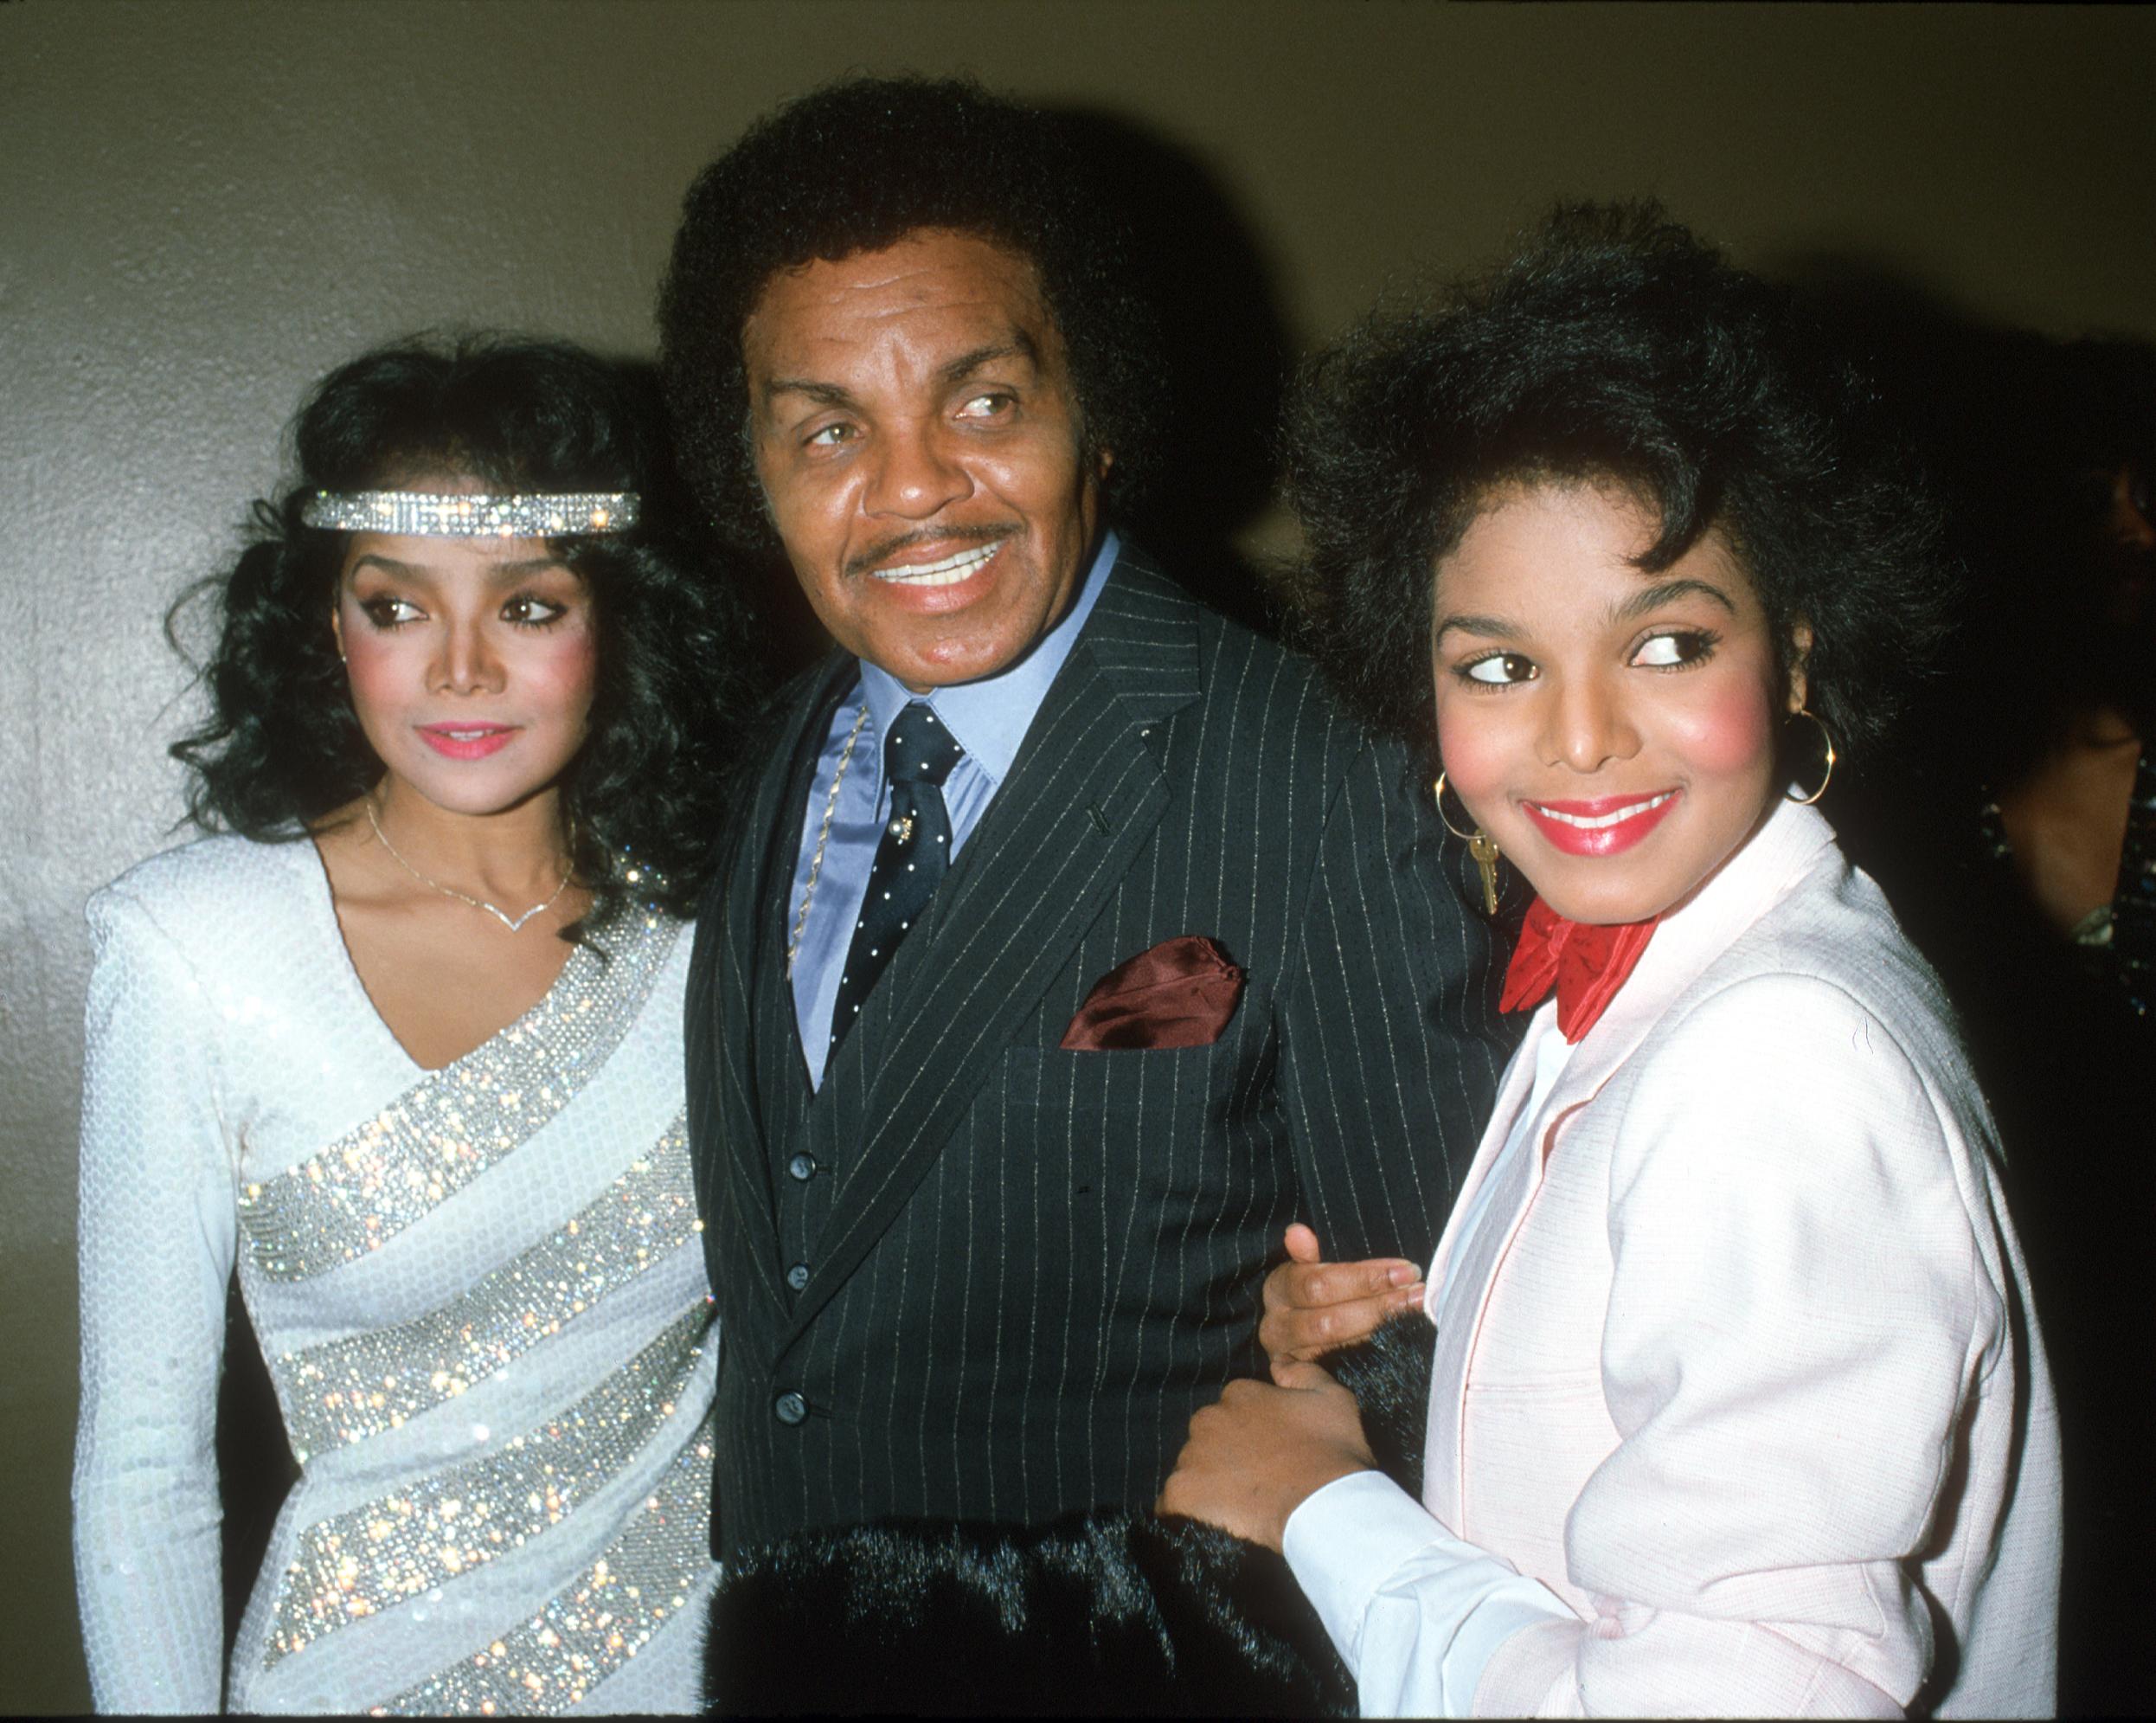 Michael Jackson's sister LaToya accuses father Joe Jackson of childhood sexual abuse